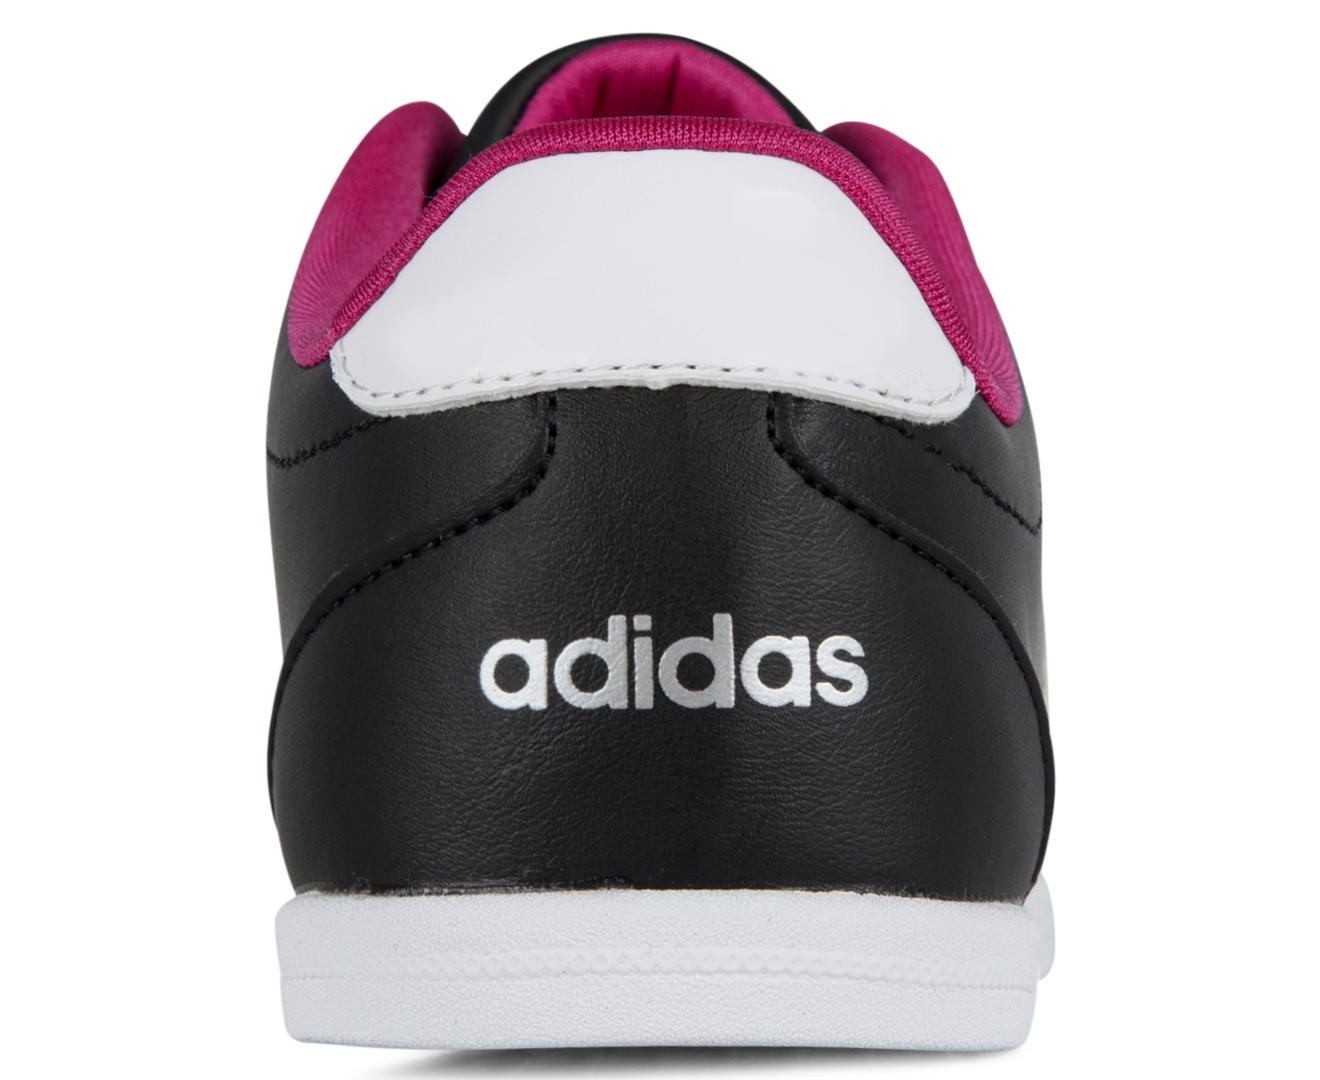 Adidas Women's Neo Coneo QT Shoes BlackWhitePink